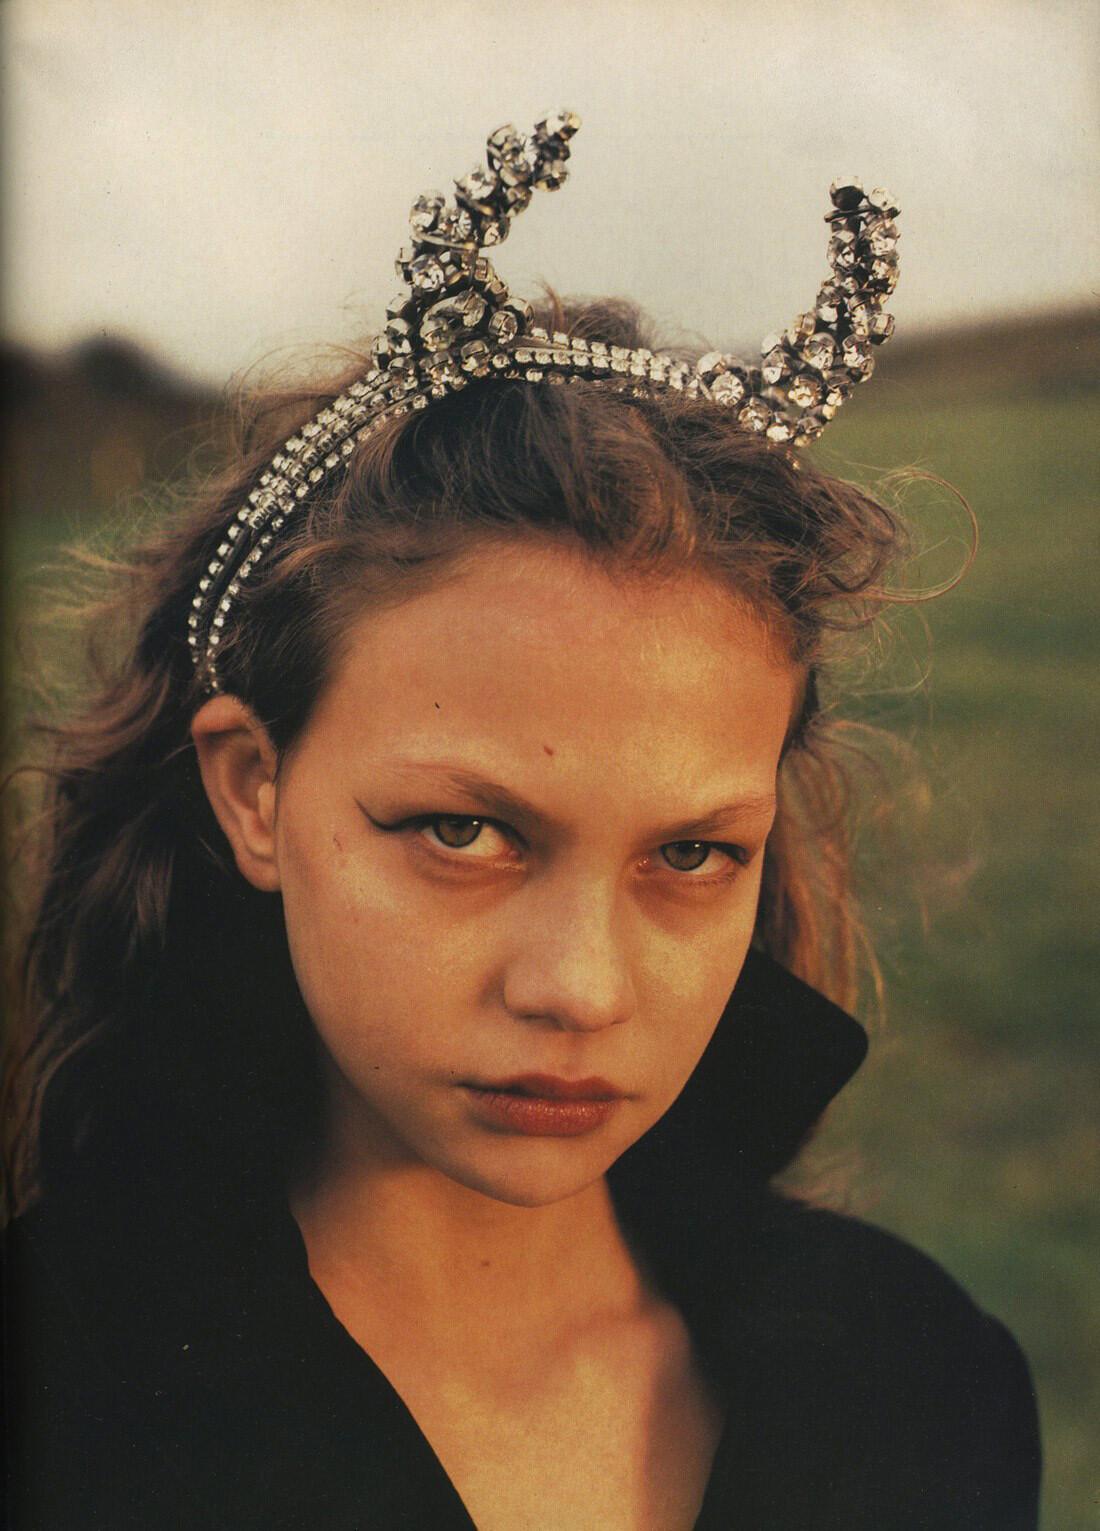 The Face, 1994 год. Фотограф Юрген Теллер